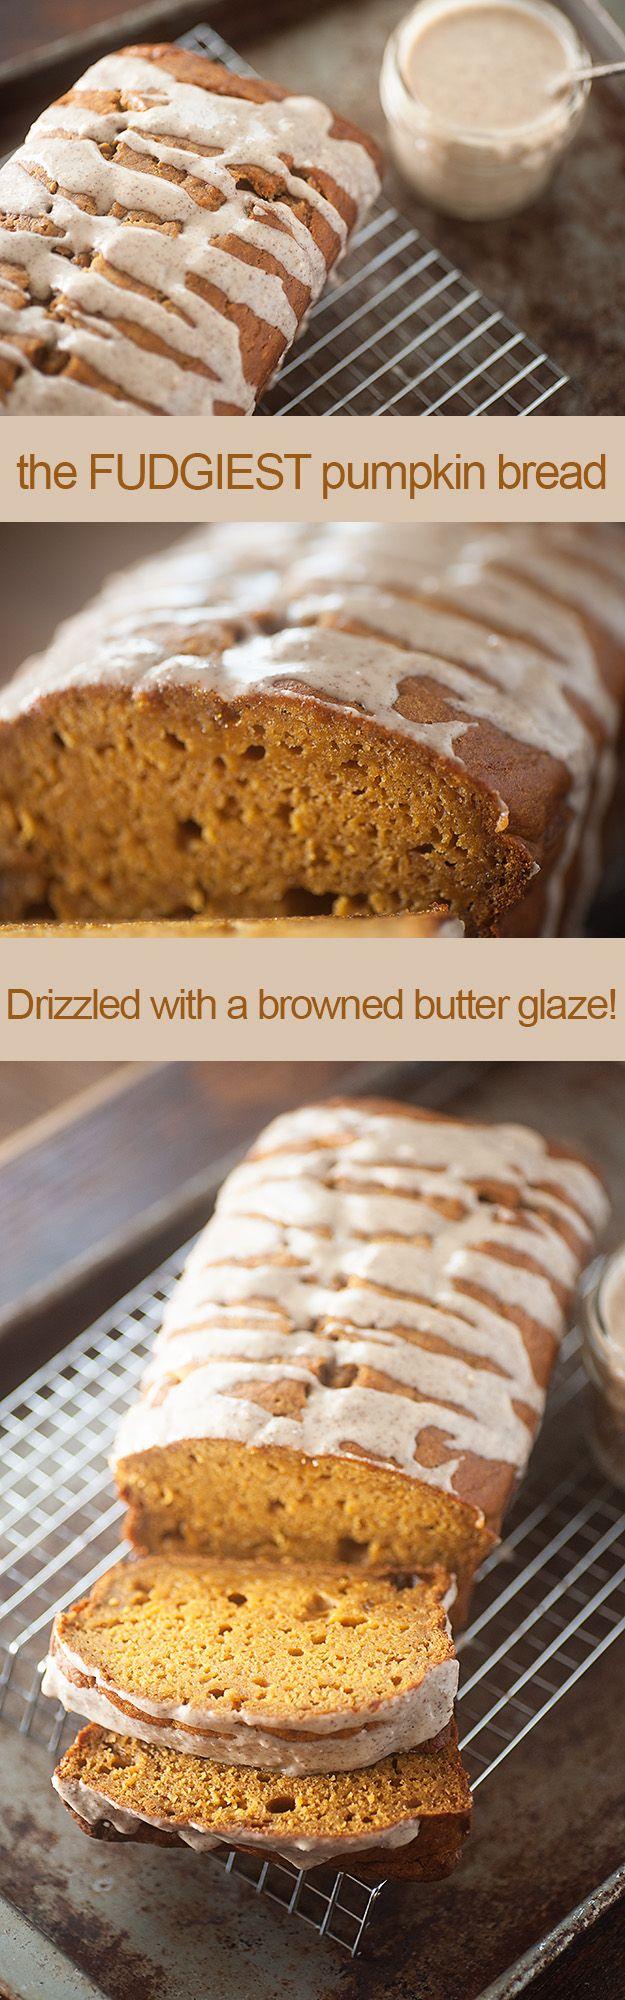 Super moist and fudgy pumpkin bread recipe! This is THE BEST pumpkin ...